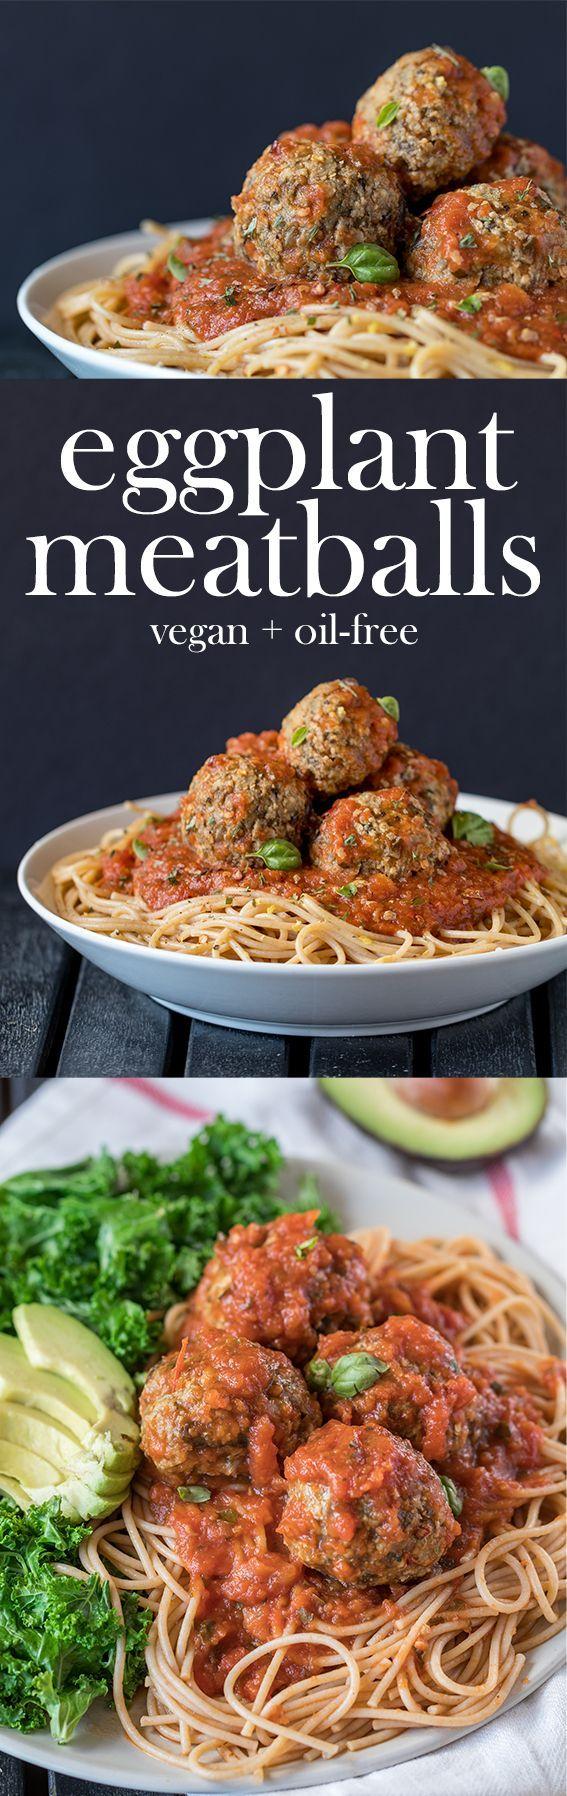 Vegan Eggplant Meatballs (Oil-free + Low-fat)